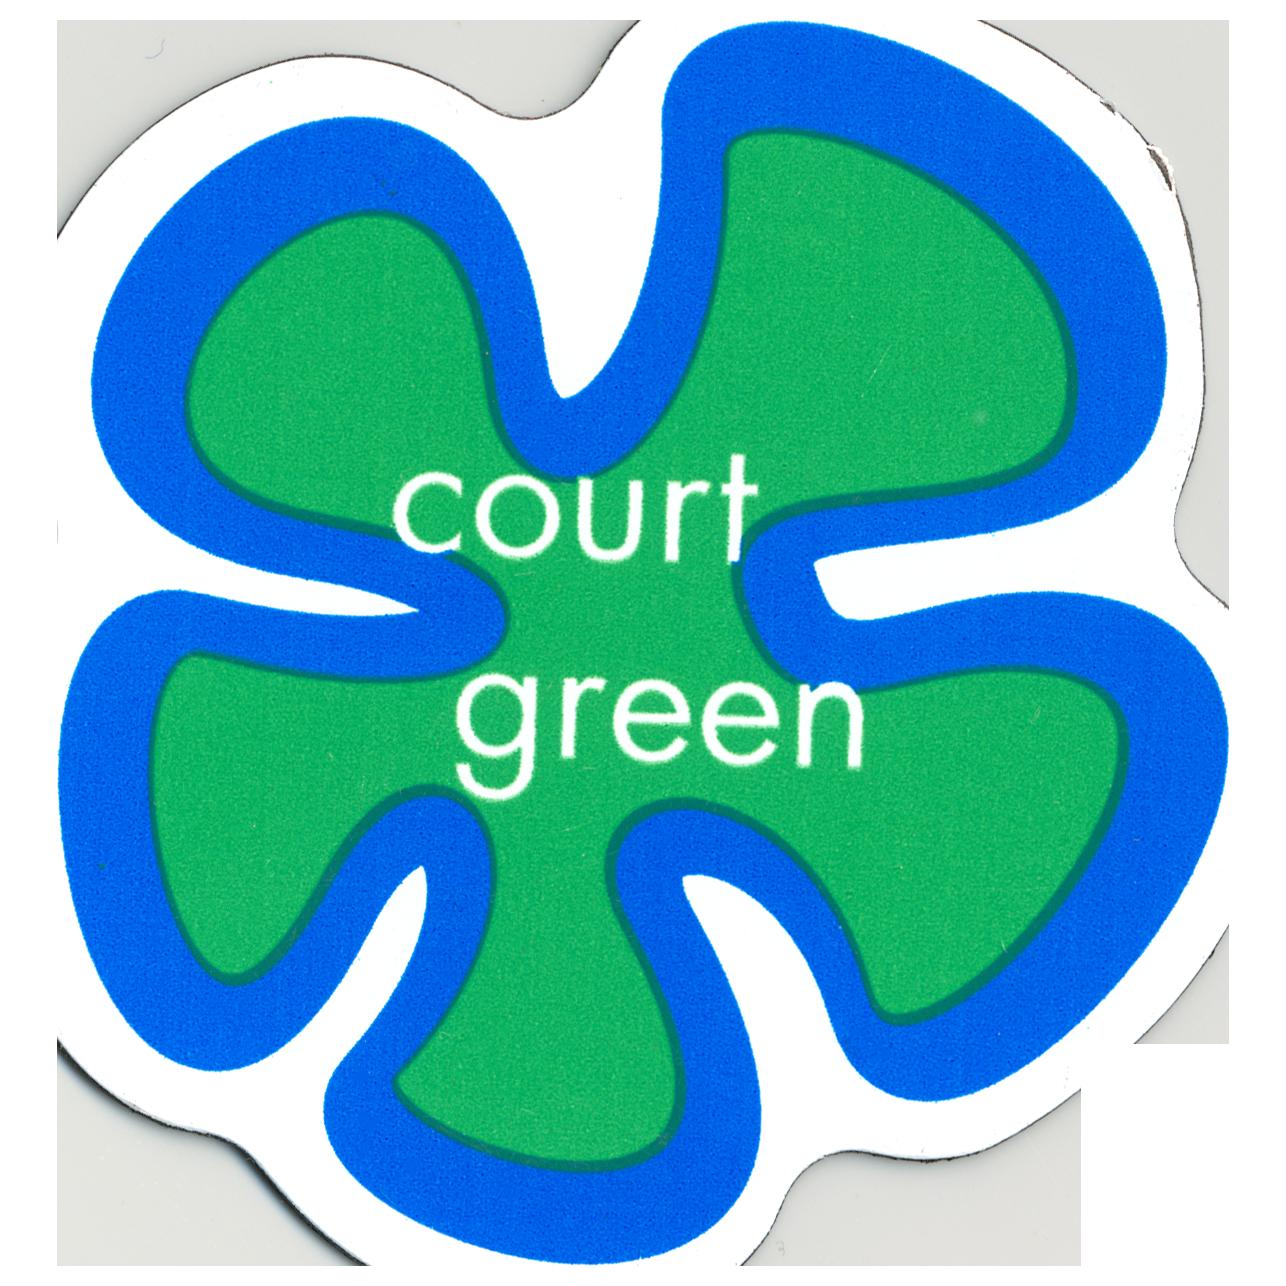 - Court Green refrigerator magnet, 2006